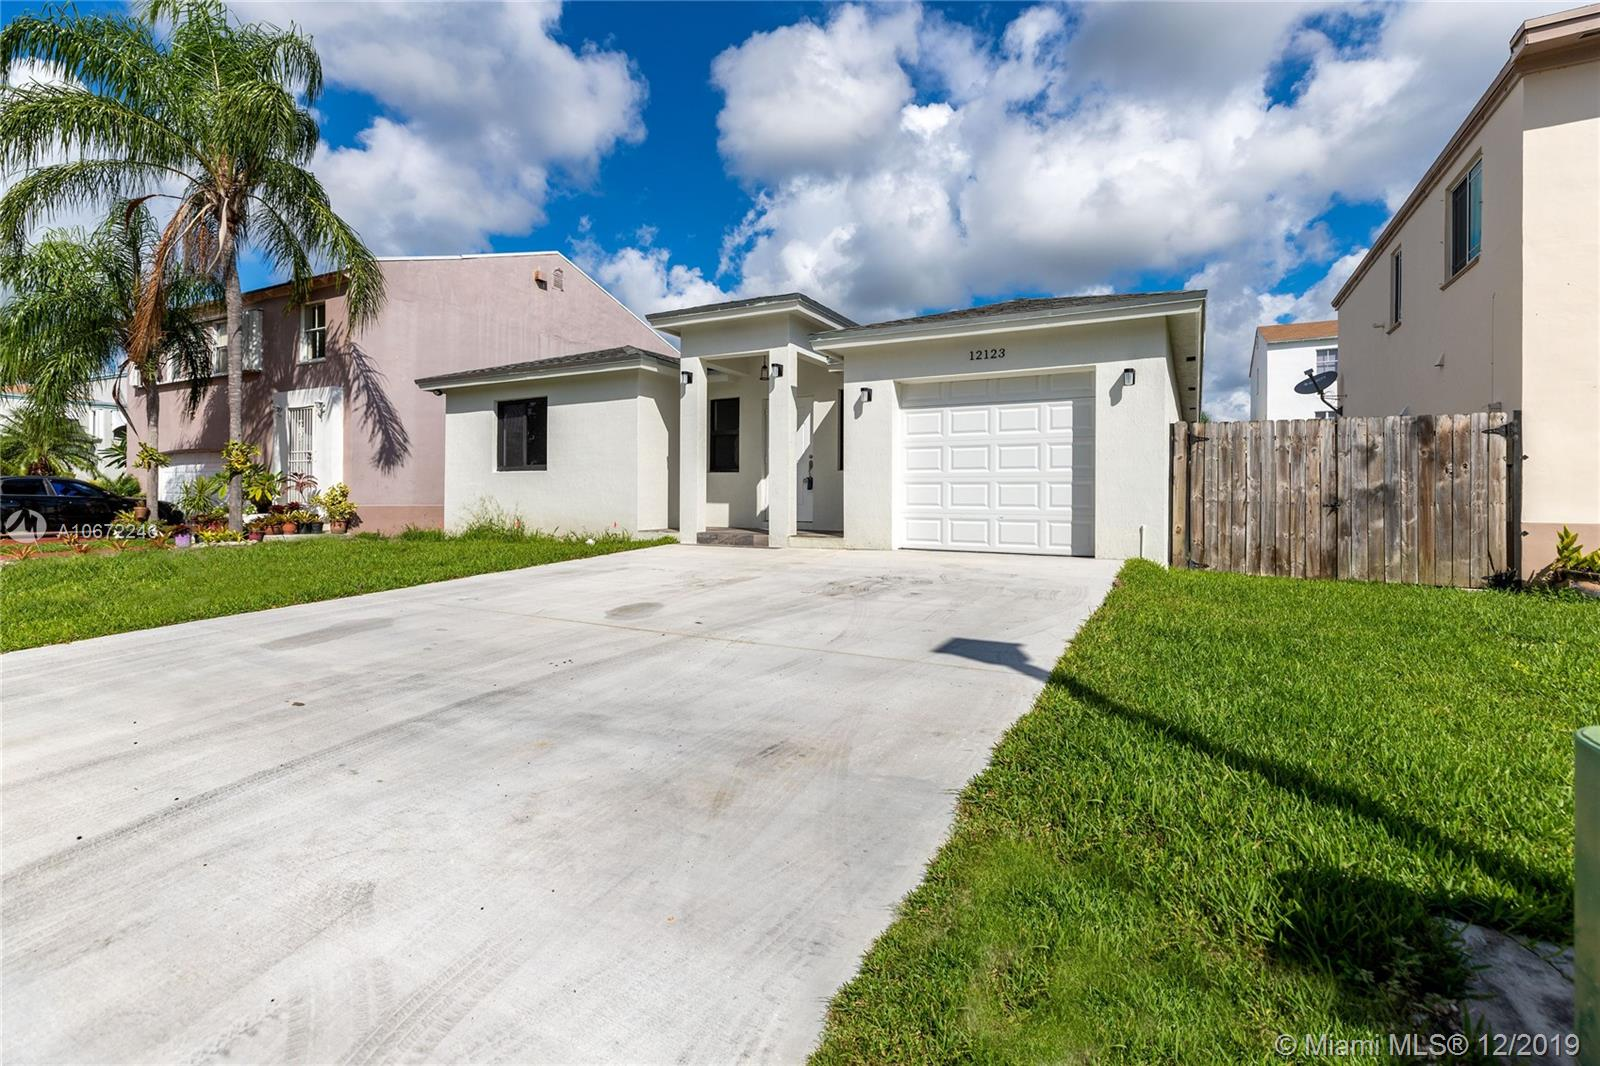 12123 SW 271st Ter, Homestead, FL 33032 - Homestead, FL real estate listing